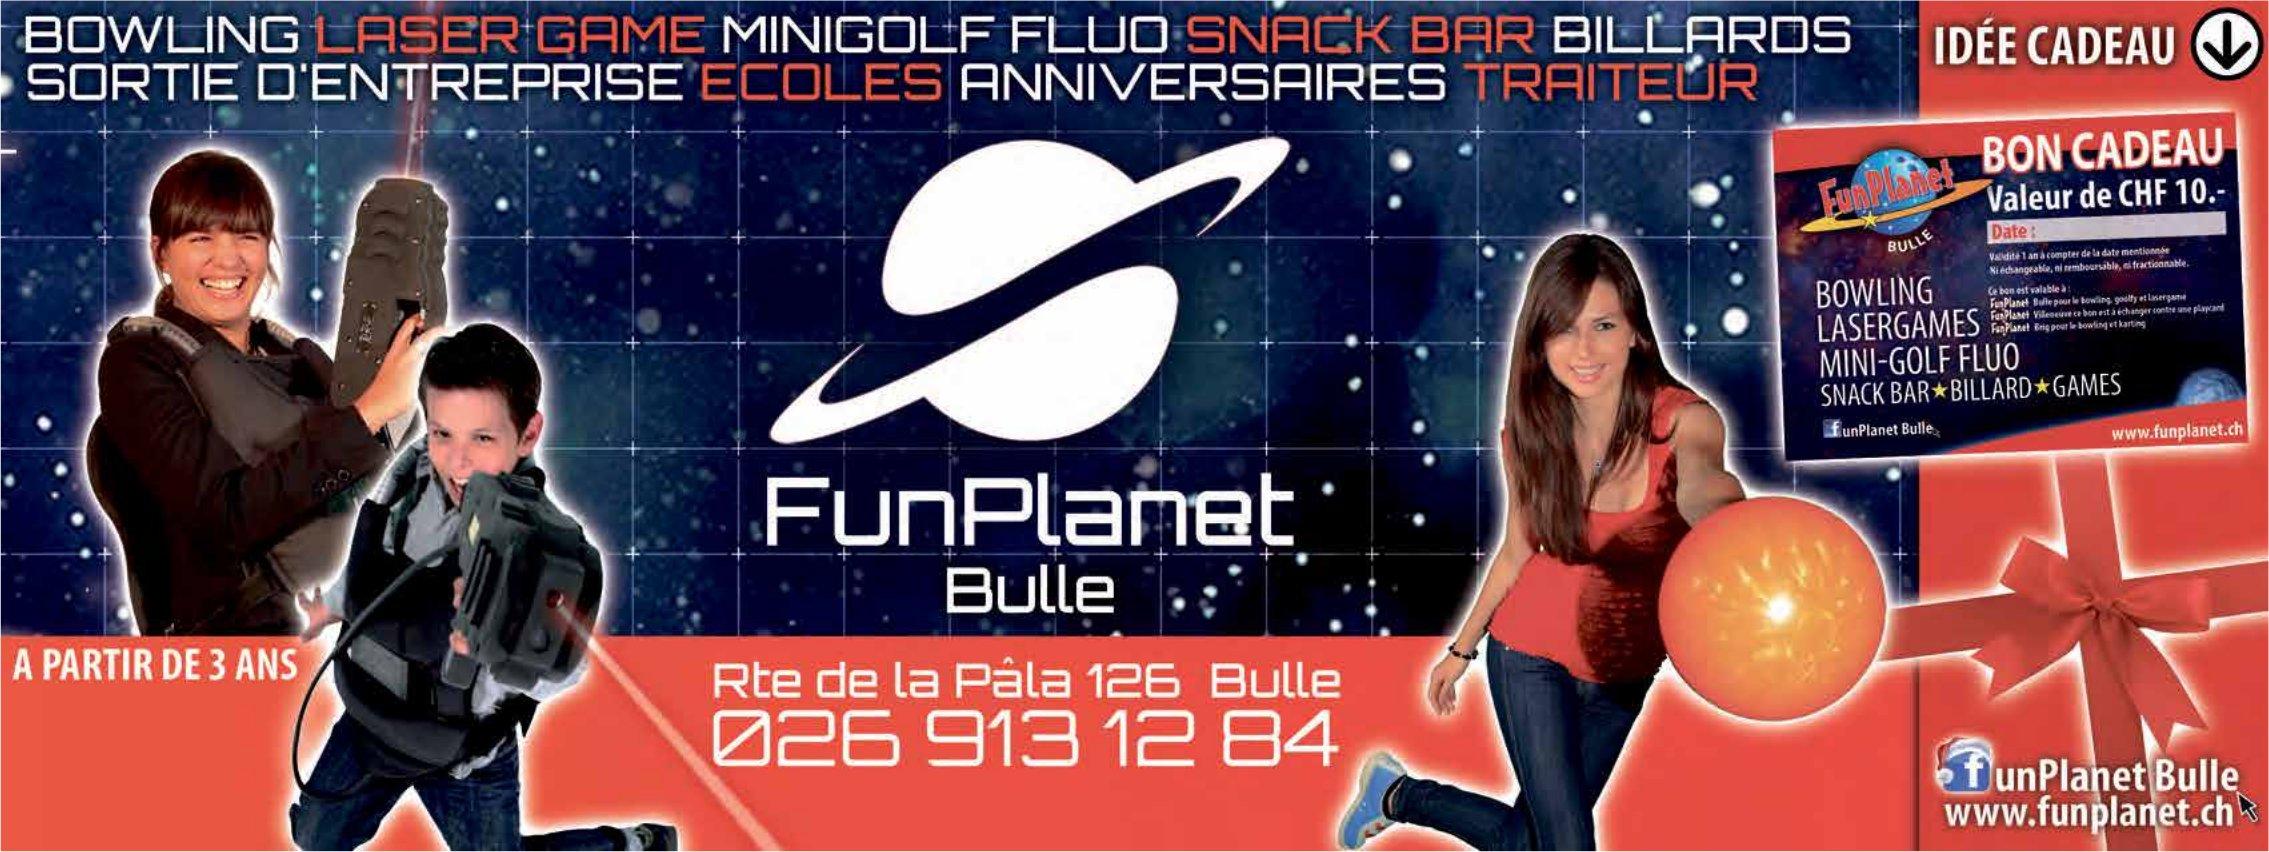 FunPlanet, Bulle, Bowling laser game